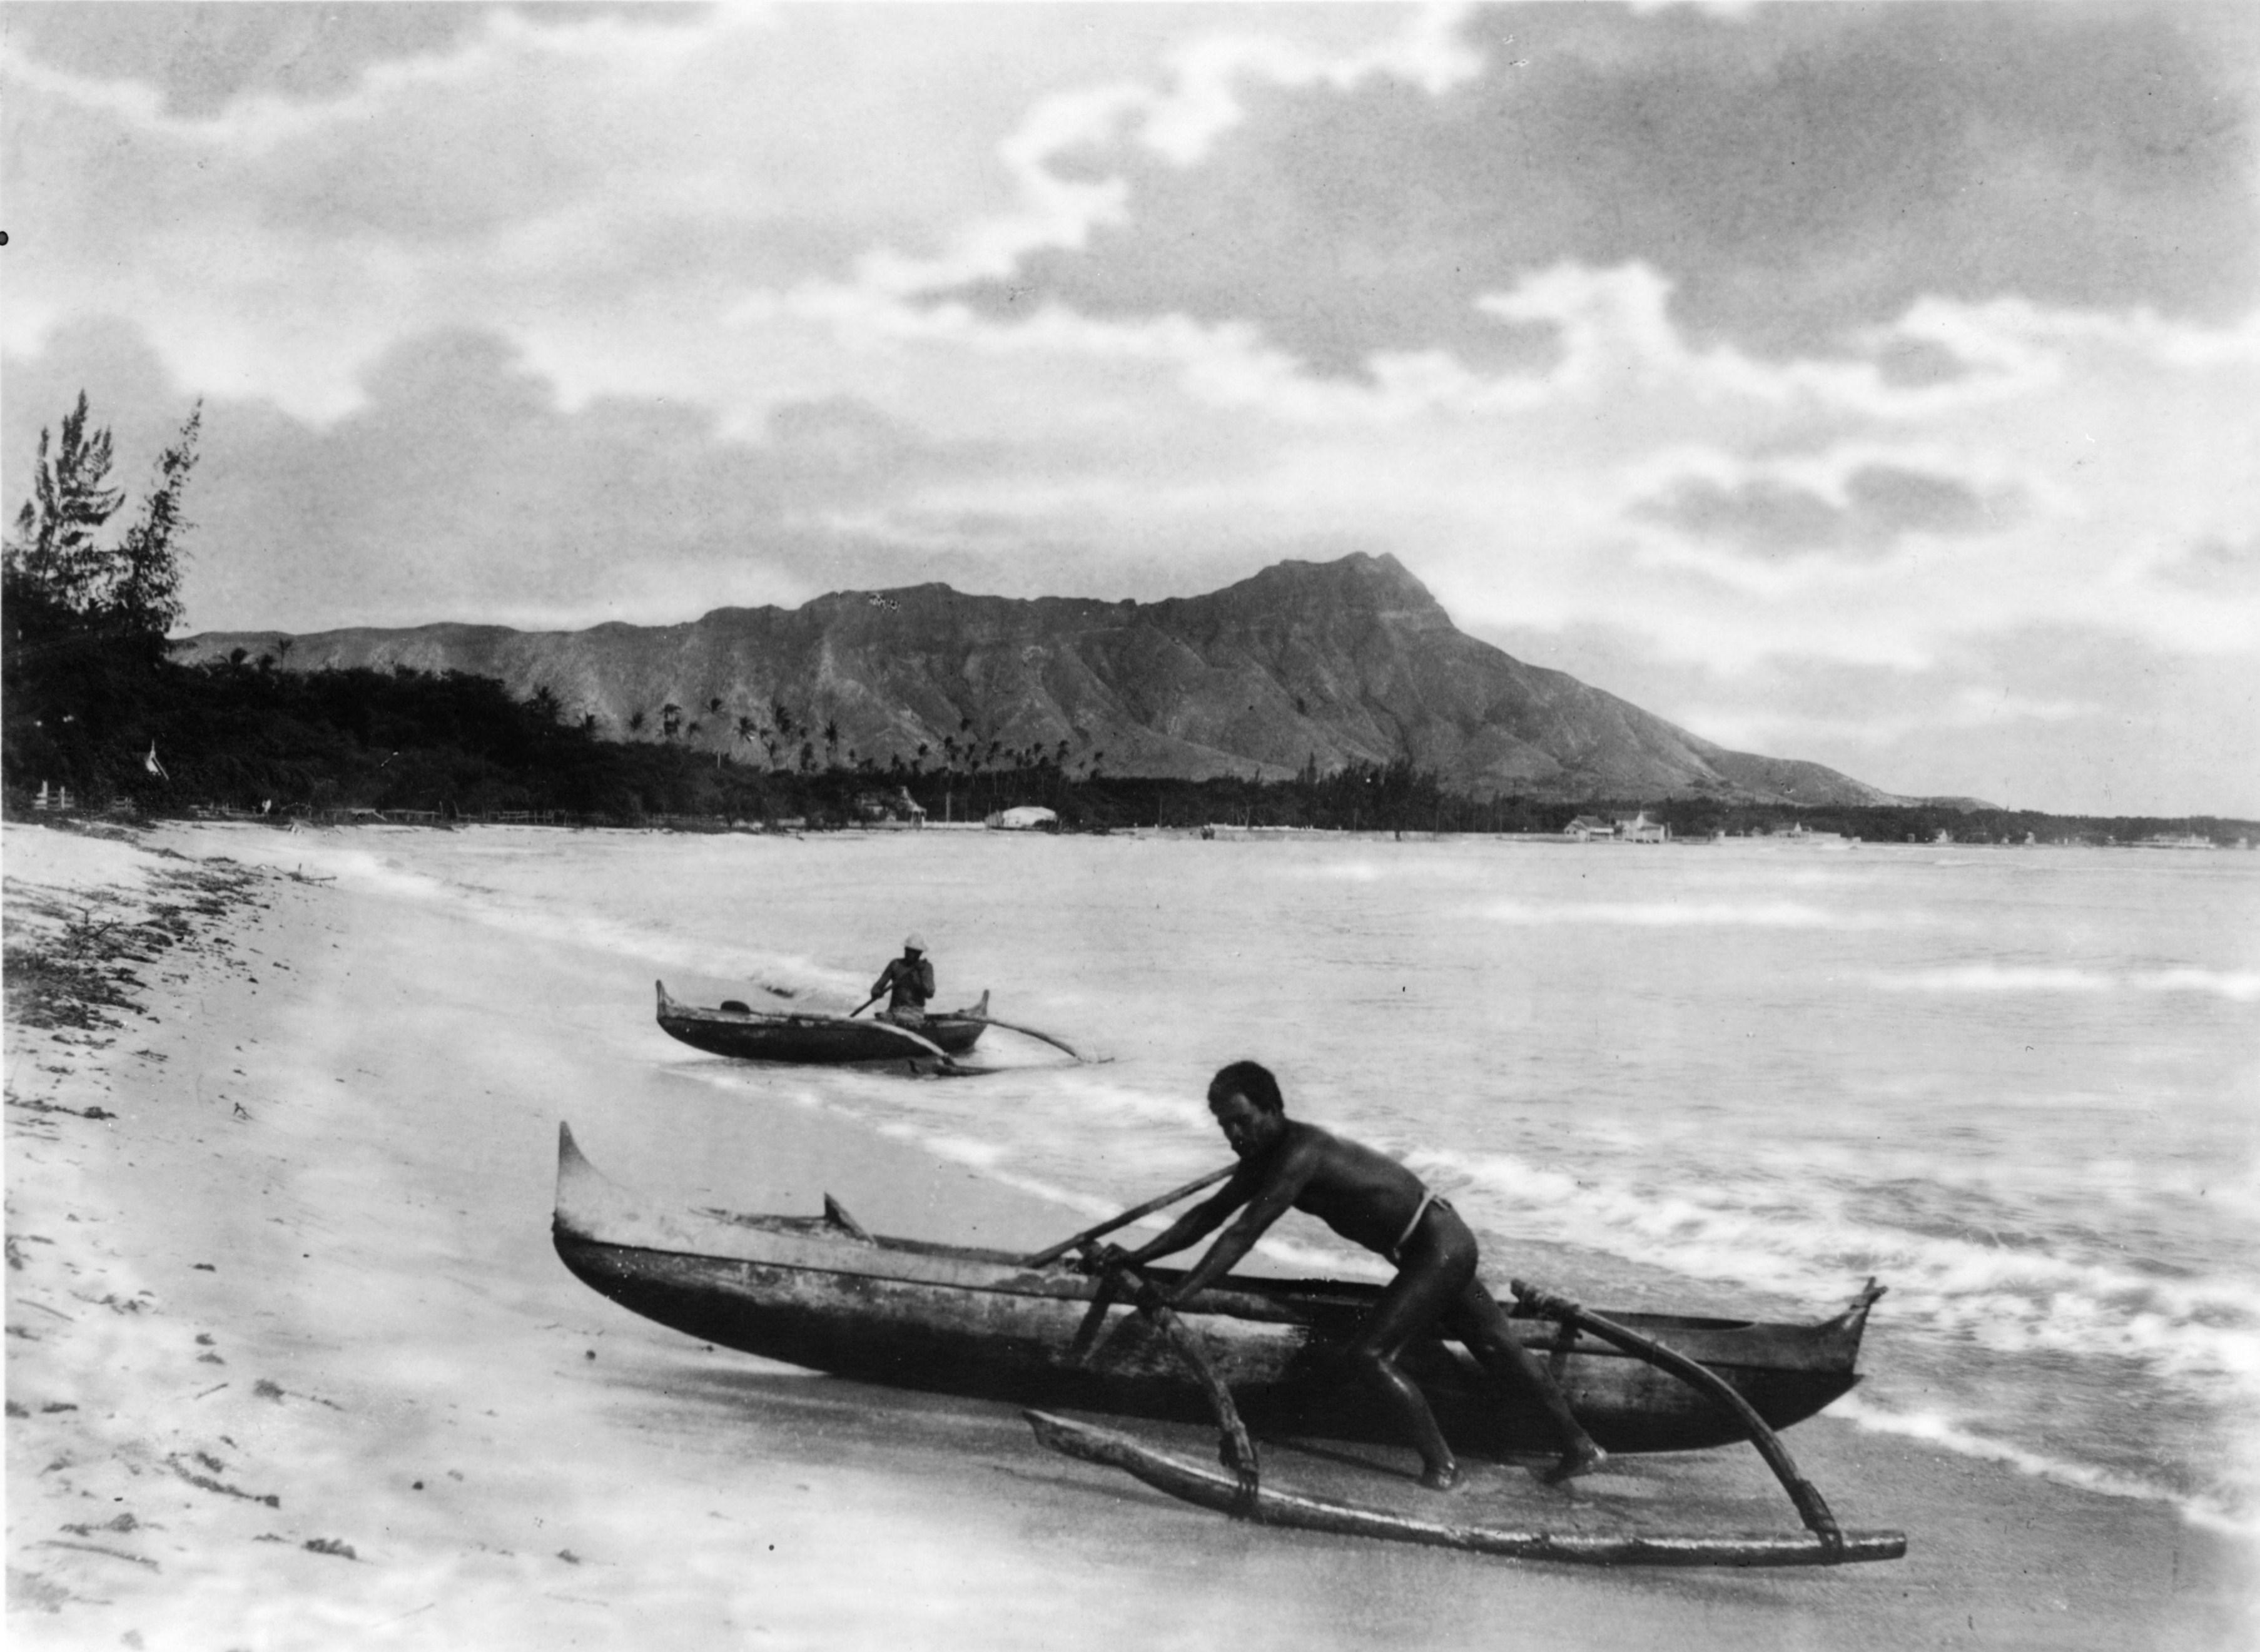 olynesianswithoutriggercanoesataikikibeach,ahusland,early20thcentury